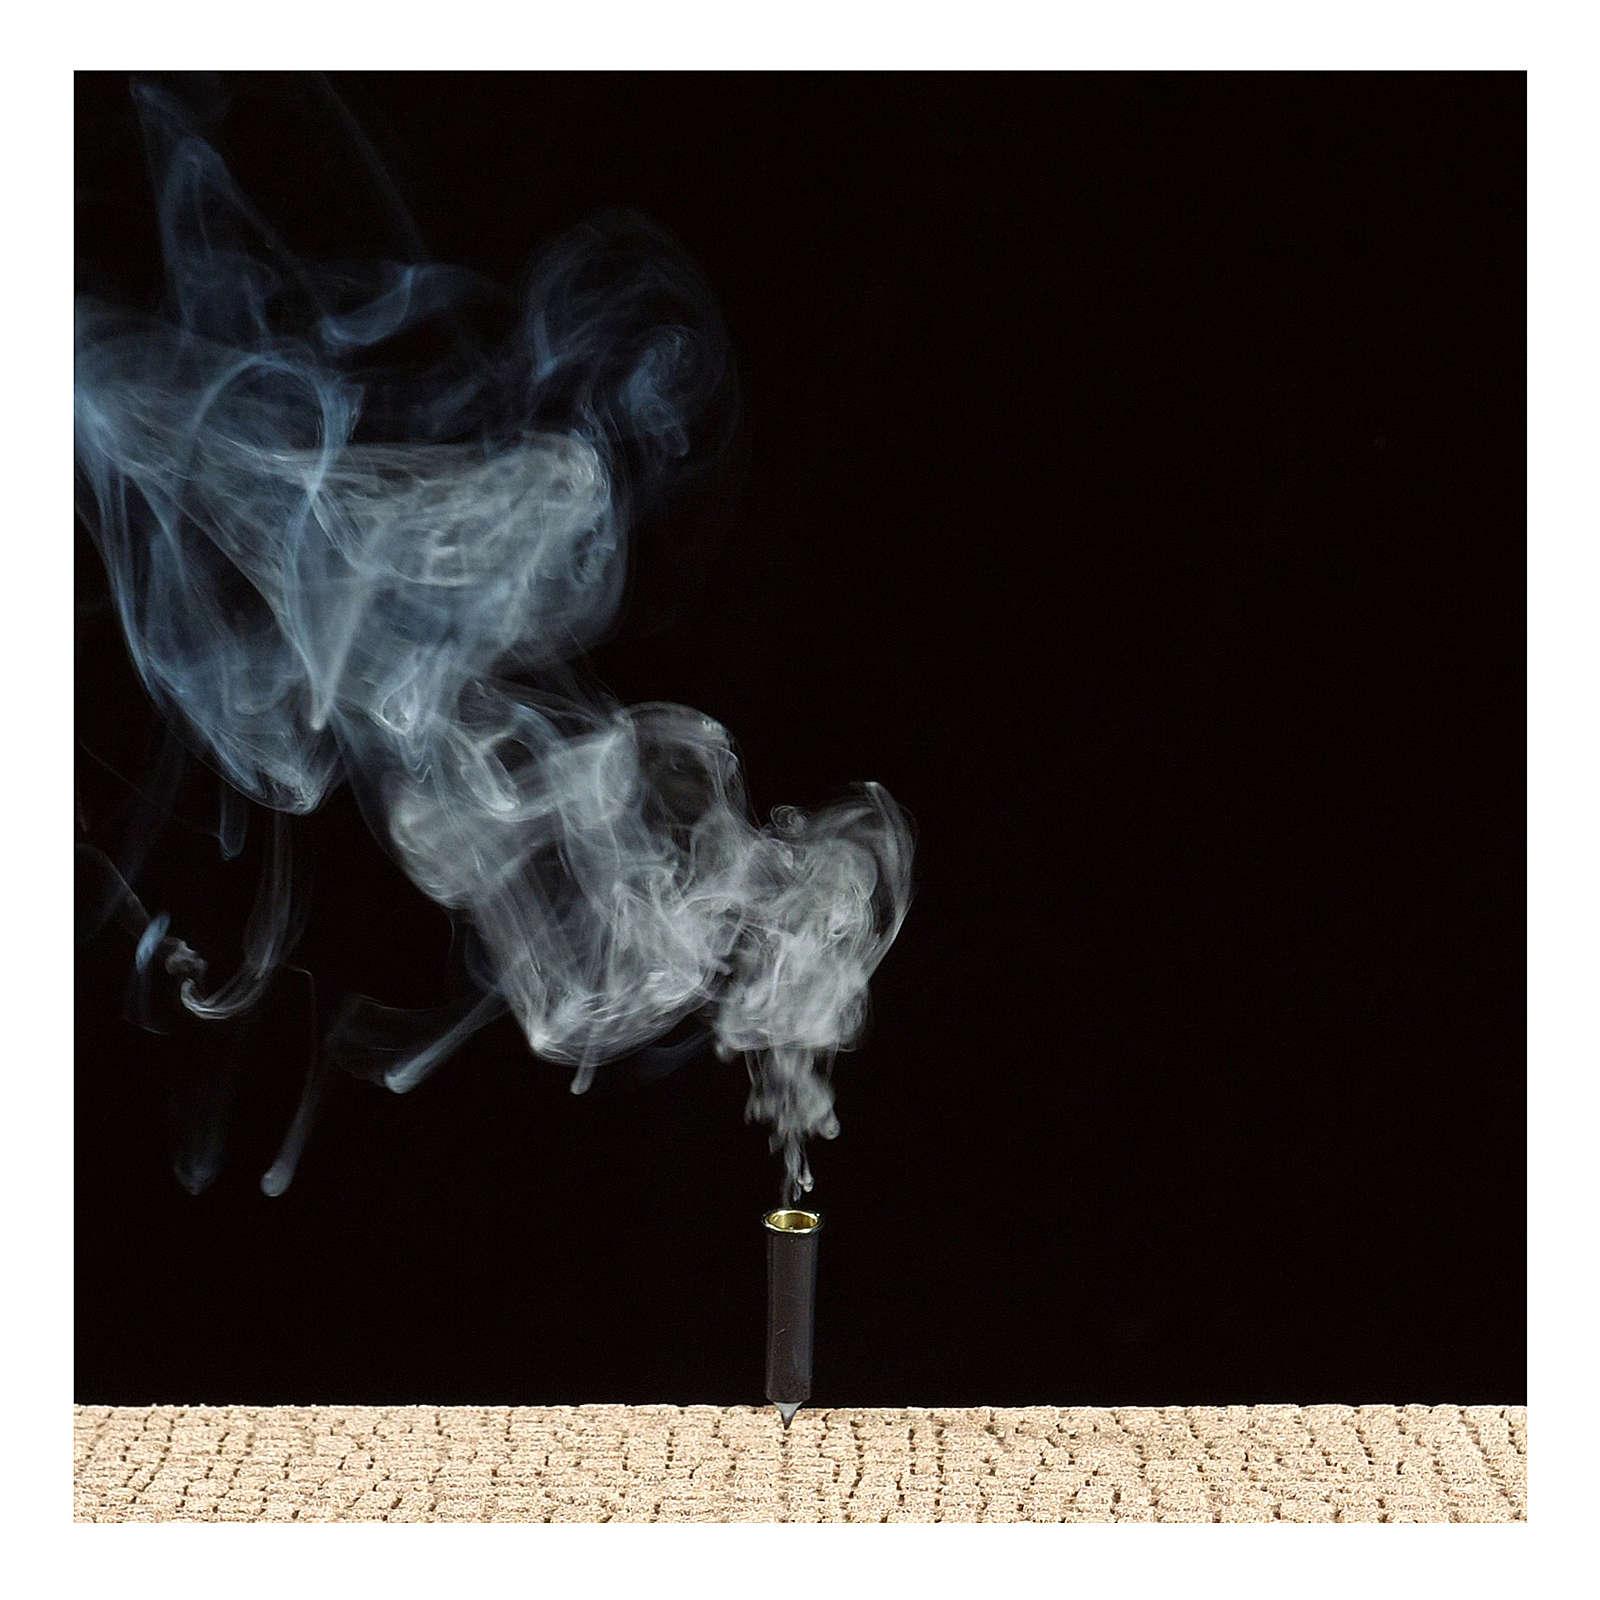 Efekt dymu szopka: cylinder generator 4.5-6V bateria 4